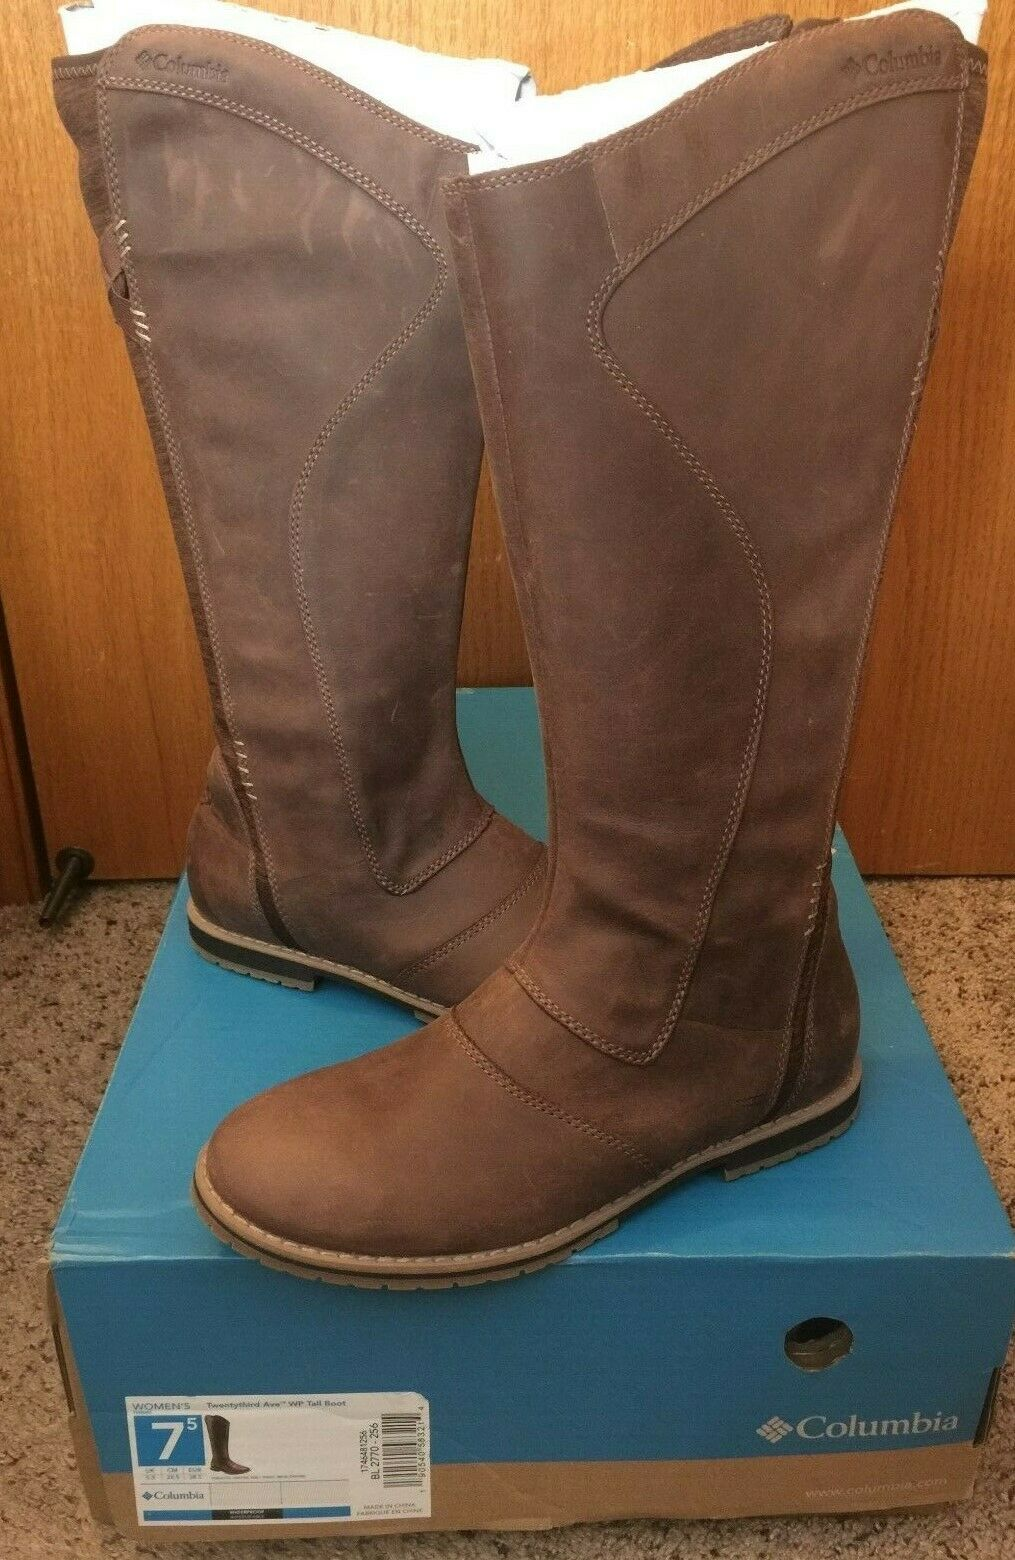 NIB Columbia Women's Brown Twentythird Ave WP Tall Riding Boot Size 7.5  7 1 2